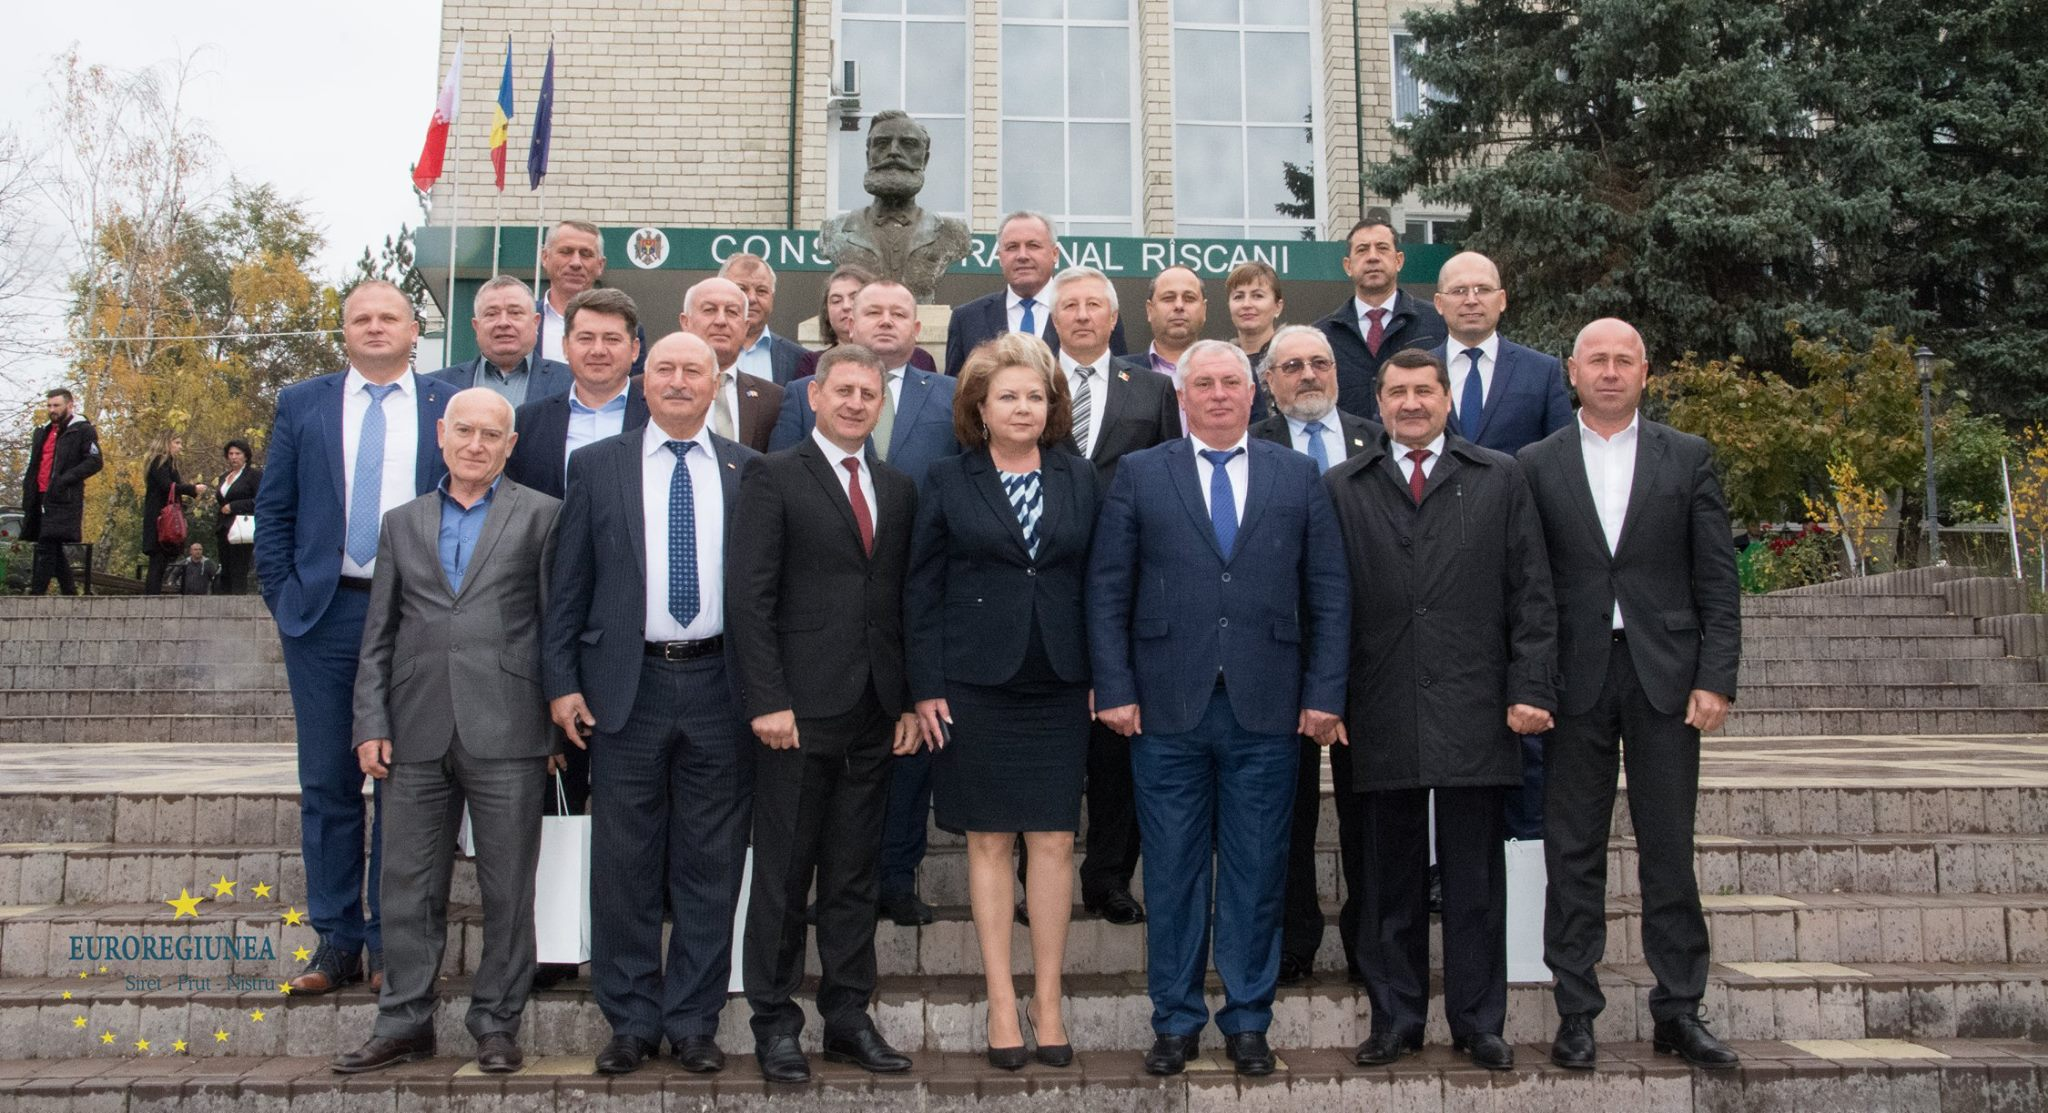 <a class=&quot;amazingslider-posttitle-link&quot; href=&quot;http://www.euroregiune.org/sedinta-ag-a-aespn-23-octombrie-riscani-republica-moldova/&quot; target=&quot;_self&quot;>Sedinta AG a AESPN - 23 octombrie Rîșcani, Republica Moldova</a>